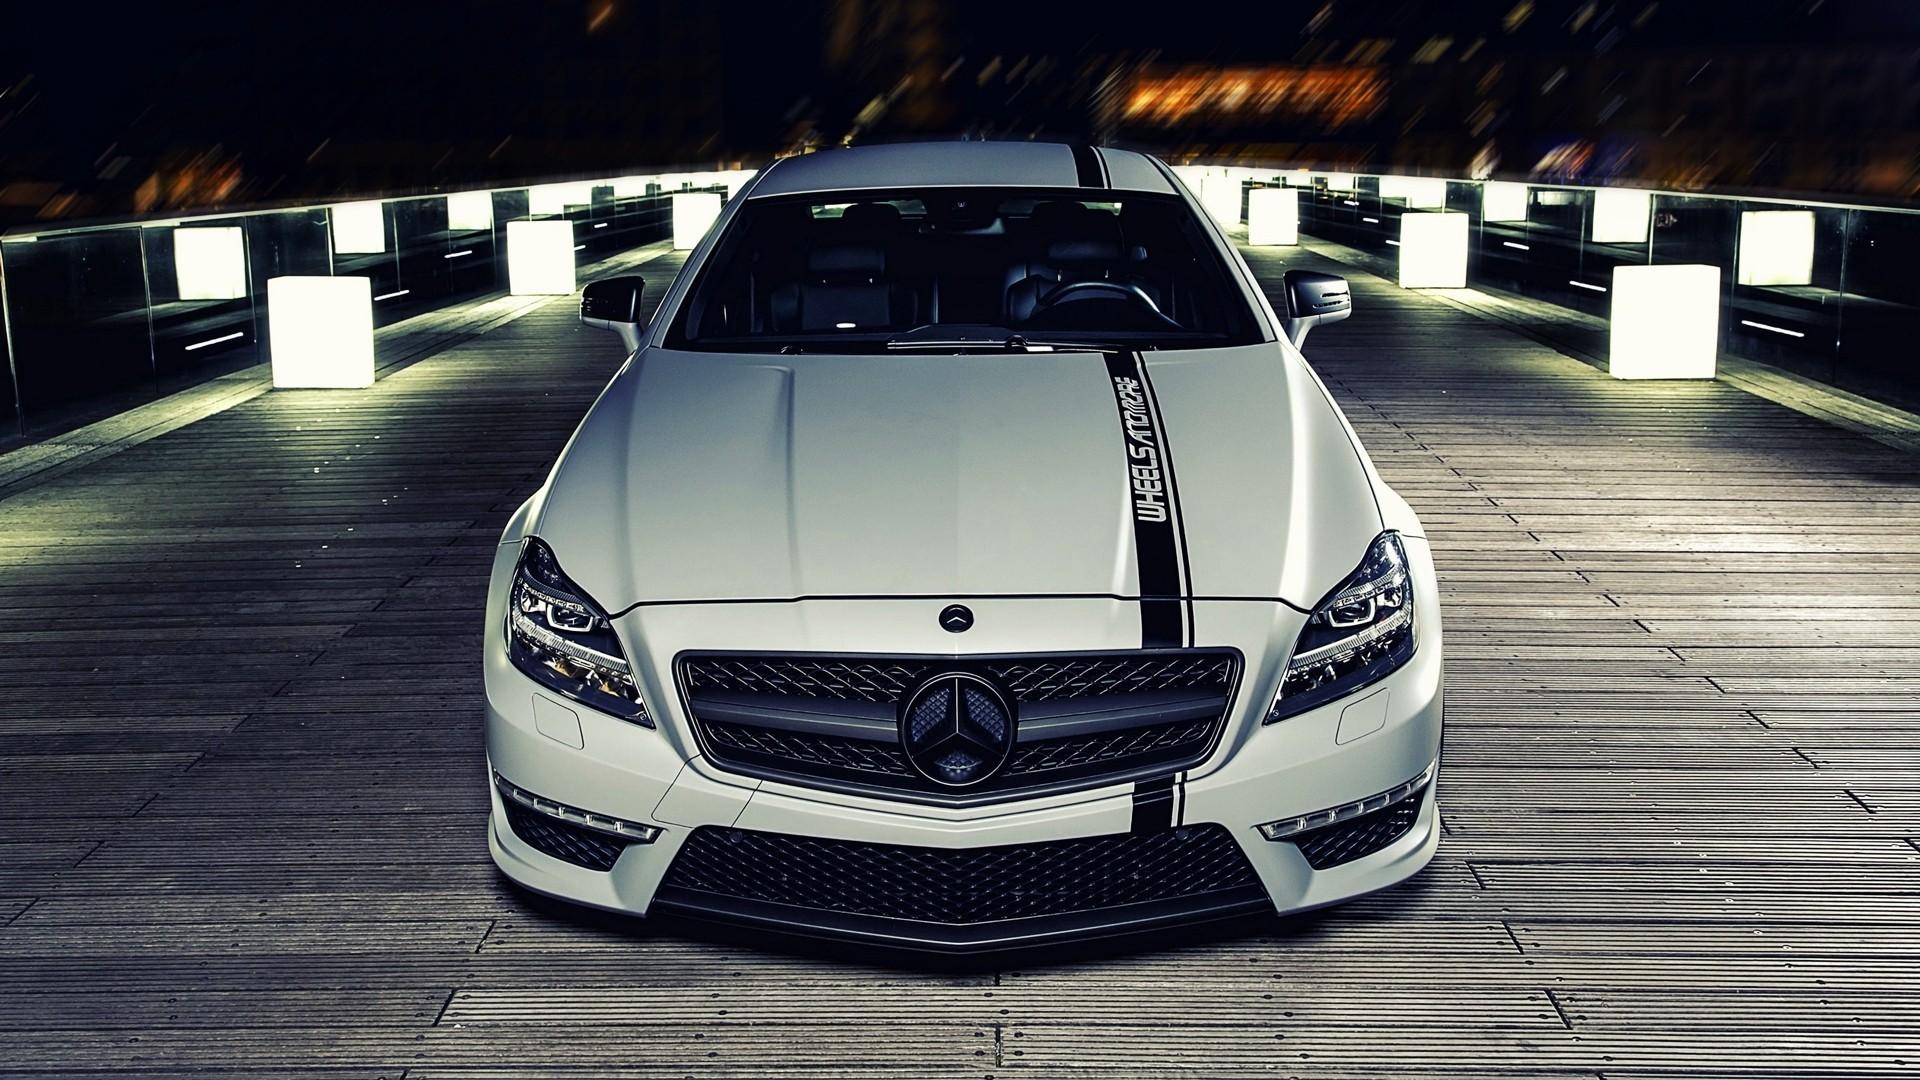 Wallpaper White Mercedes Benz Performance Car Sedan C63 Amg